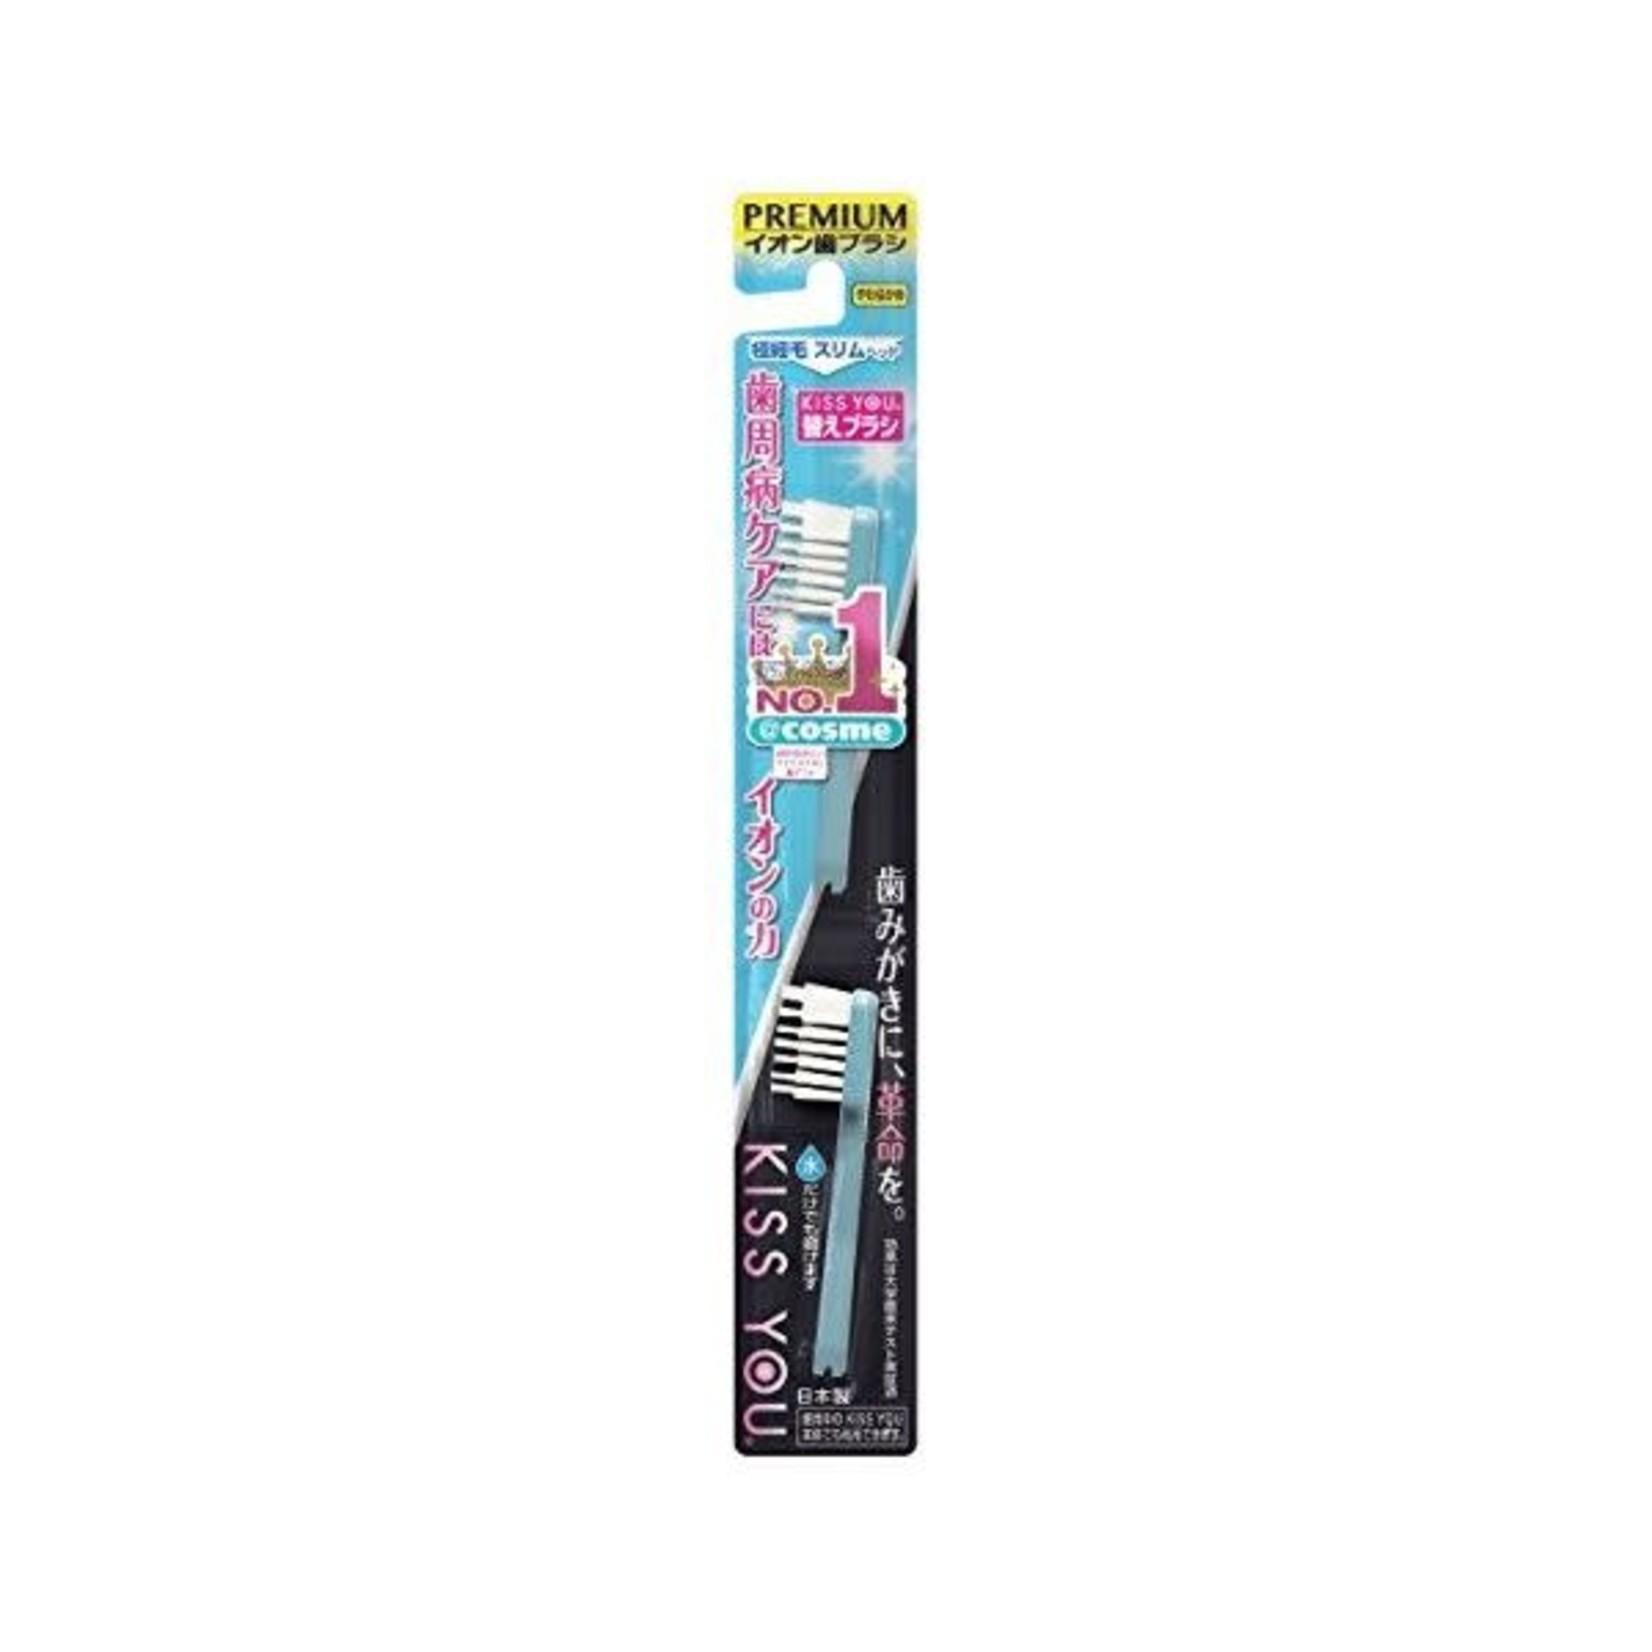 Fukuba Fukuba Dental Kiss You Toothbrush Soft H33  Refill